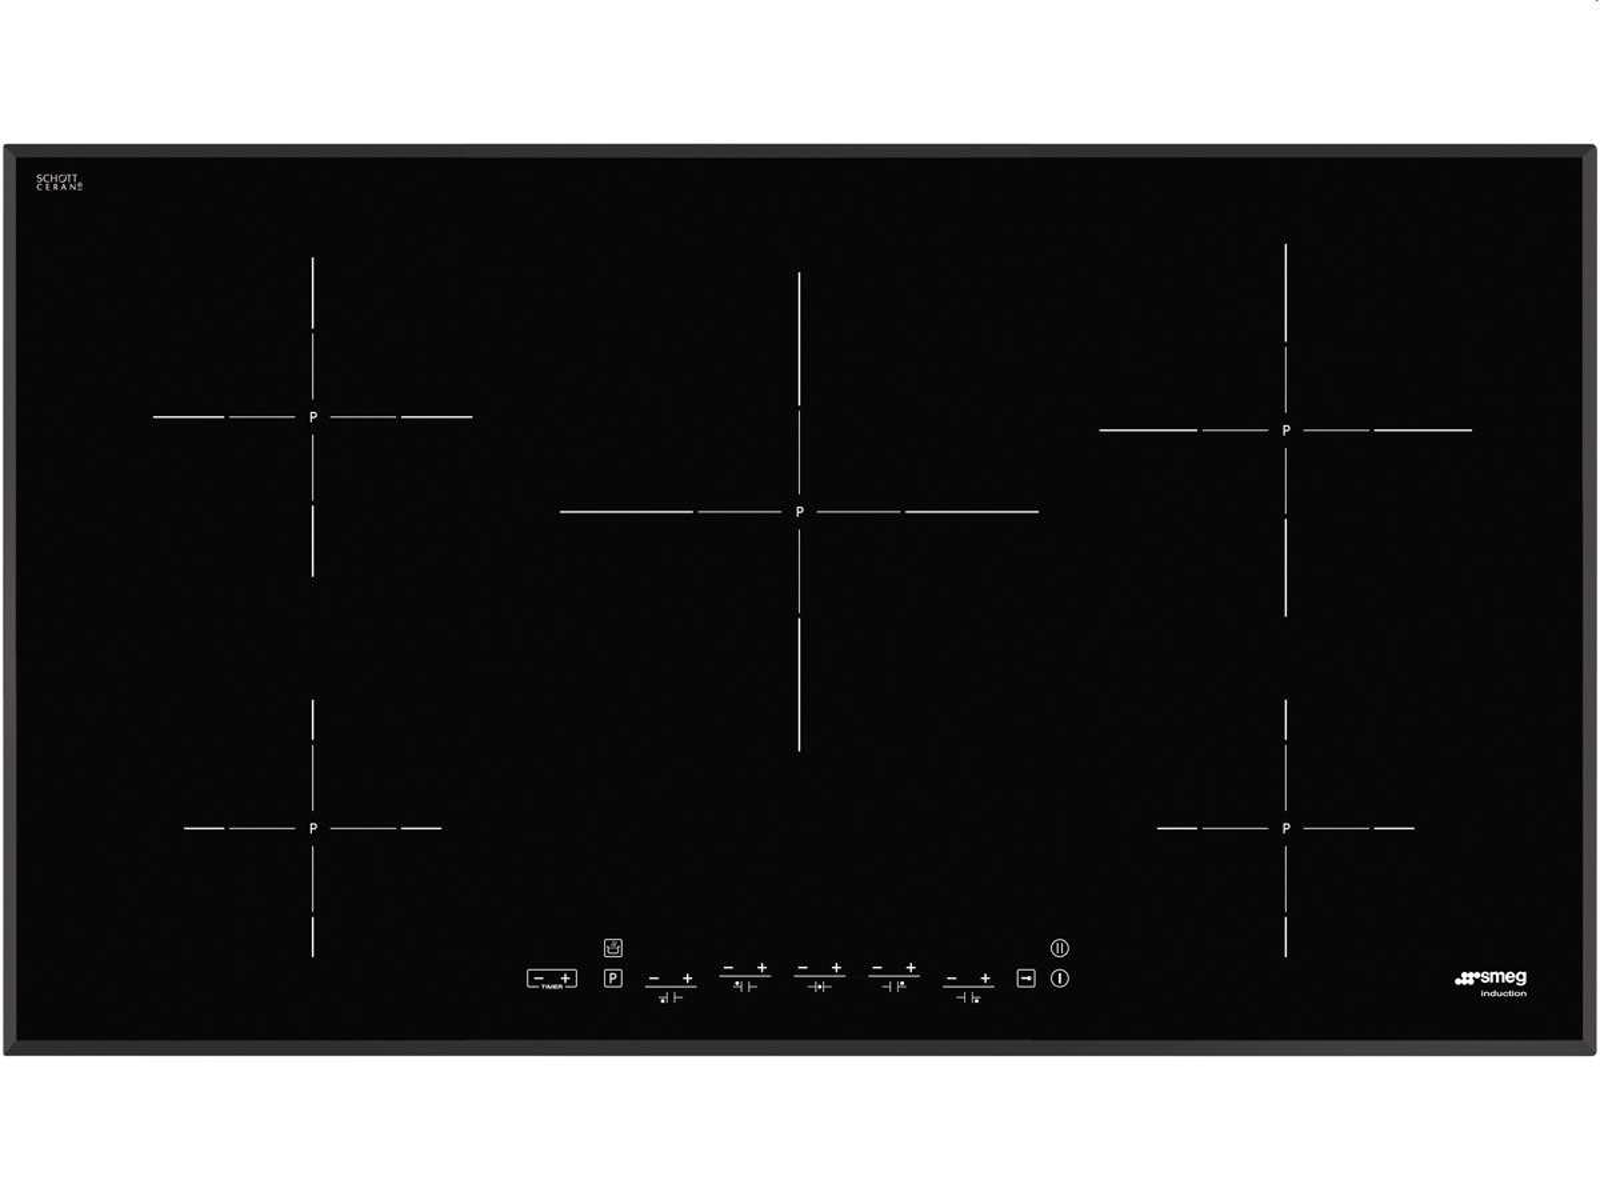 Produktabbildung von Smeg SI5952B Induktion Glaskeramik Kochfeld autark